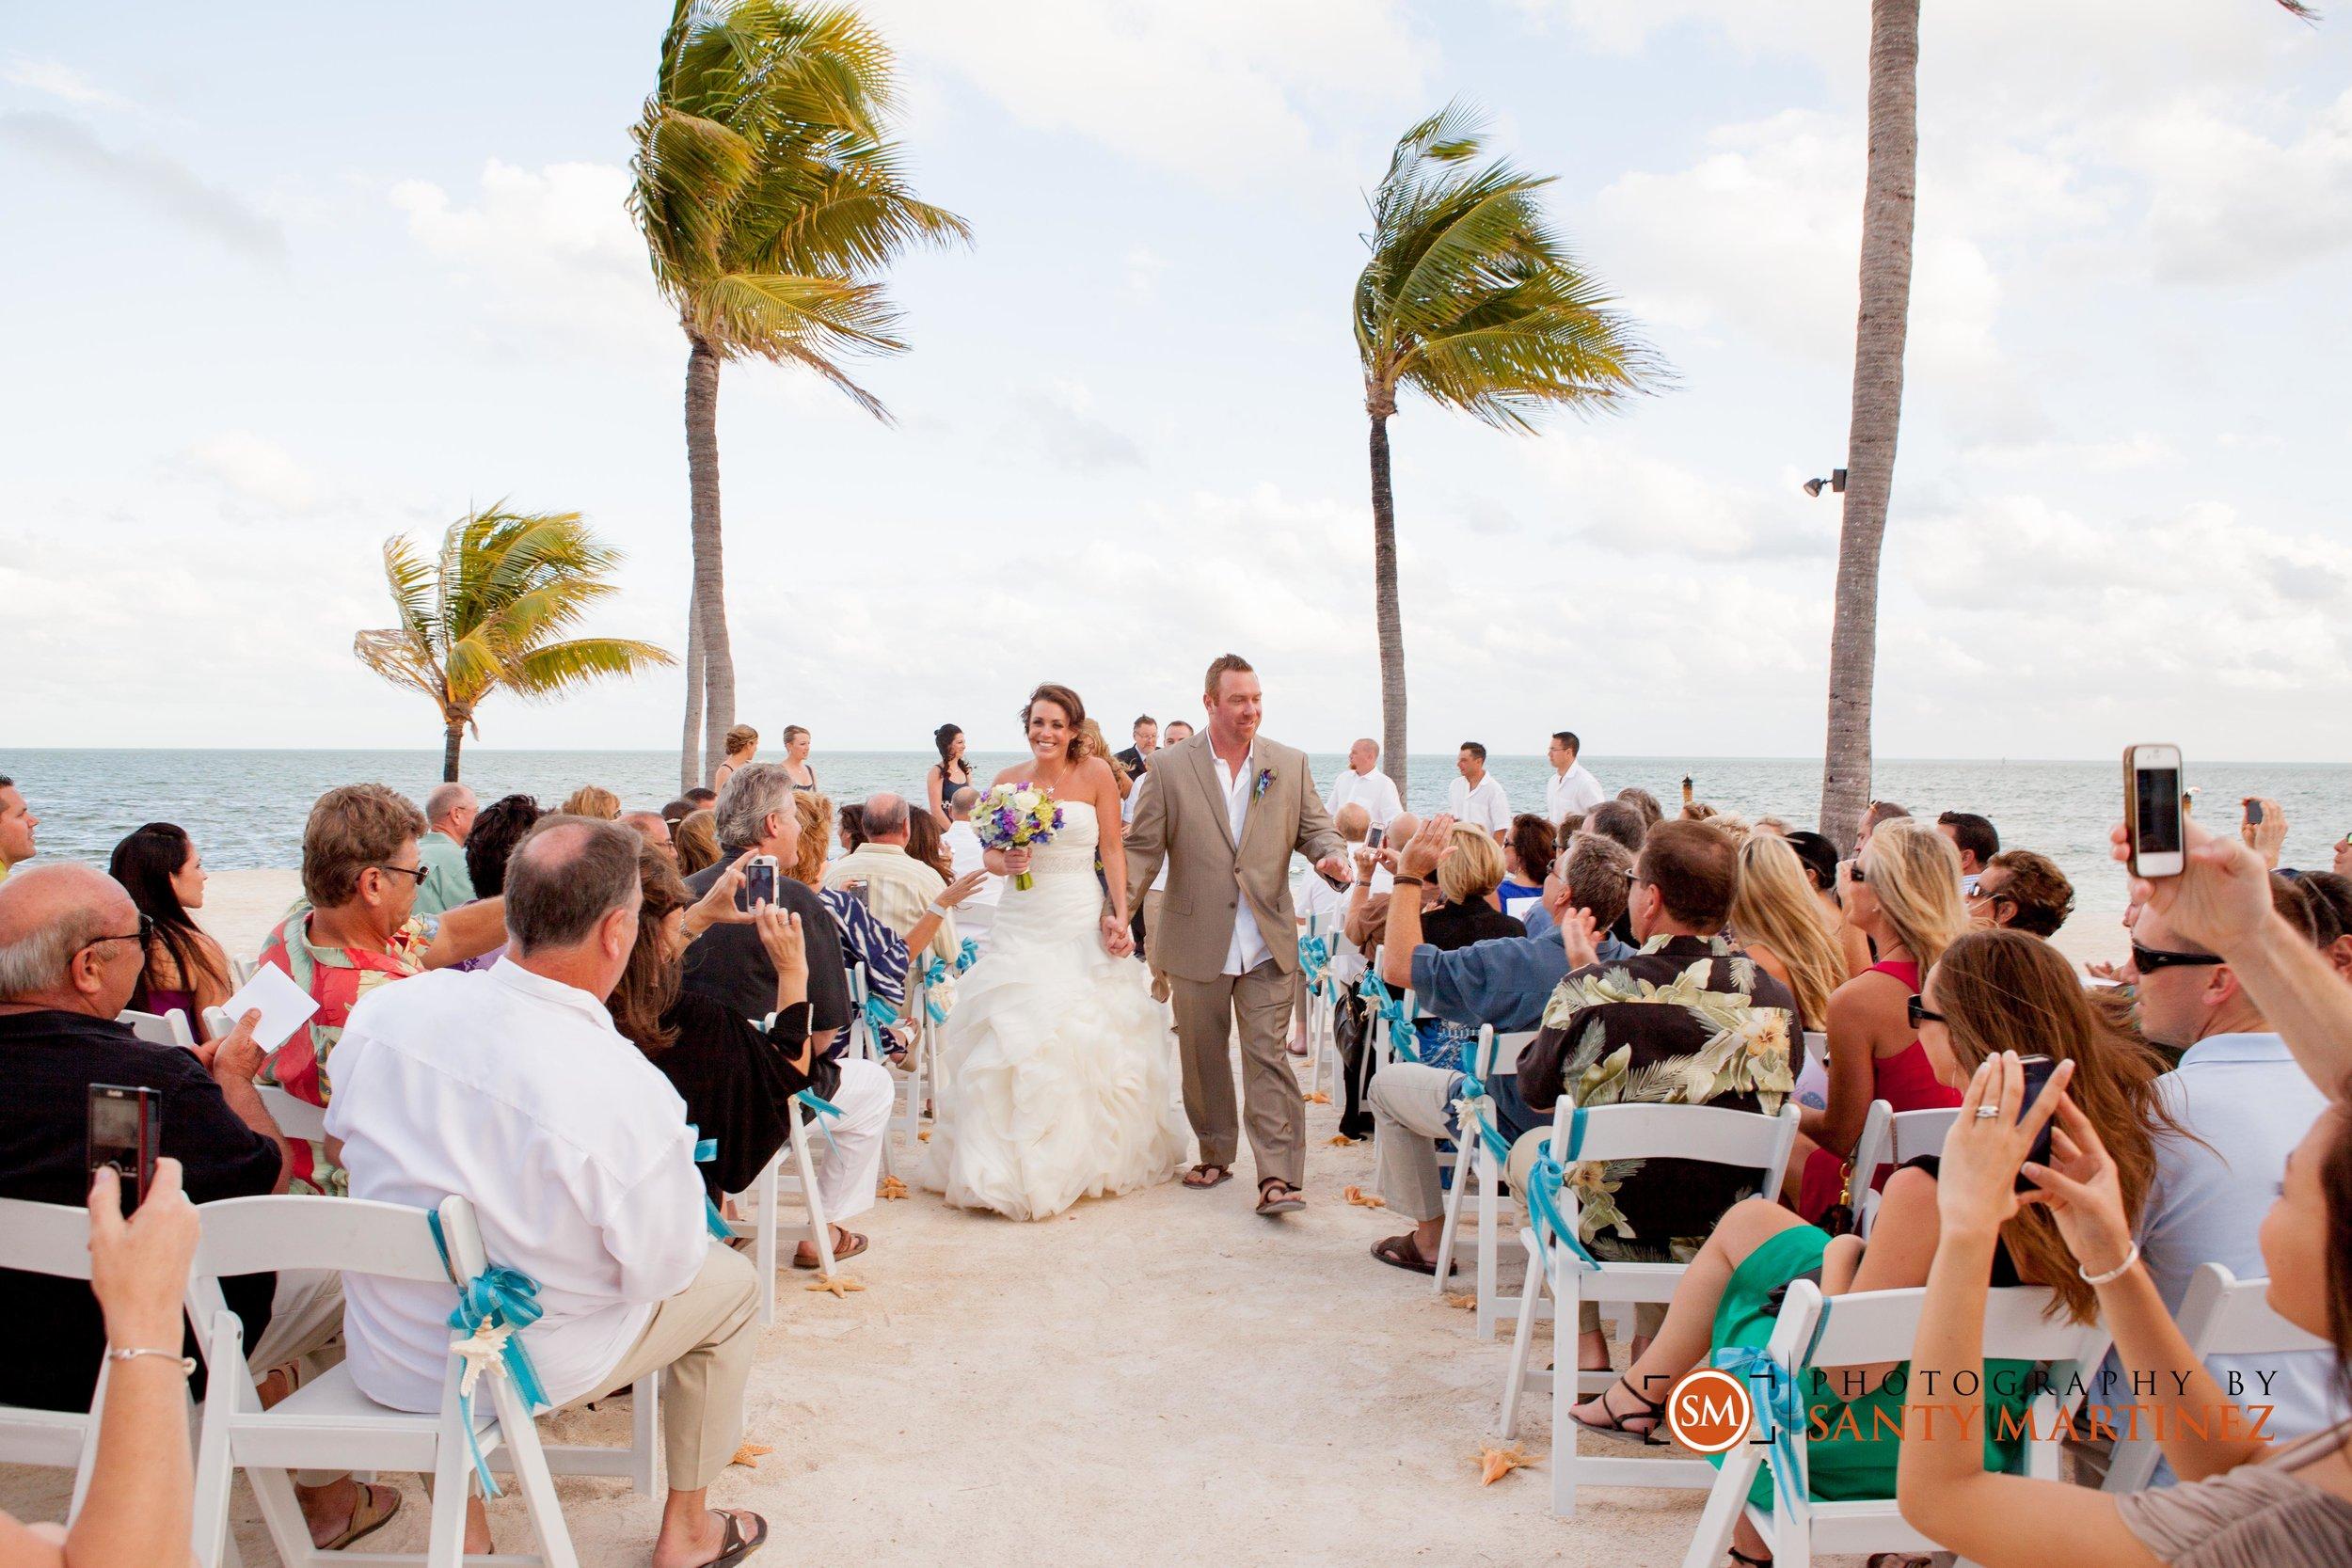 Photography by Santy Martinez - Miami Wedding Photographer-041.jpg